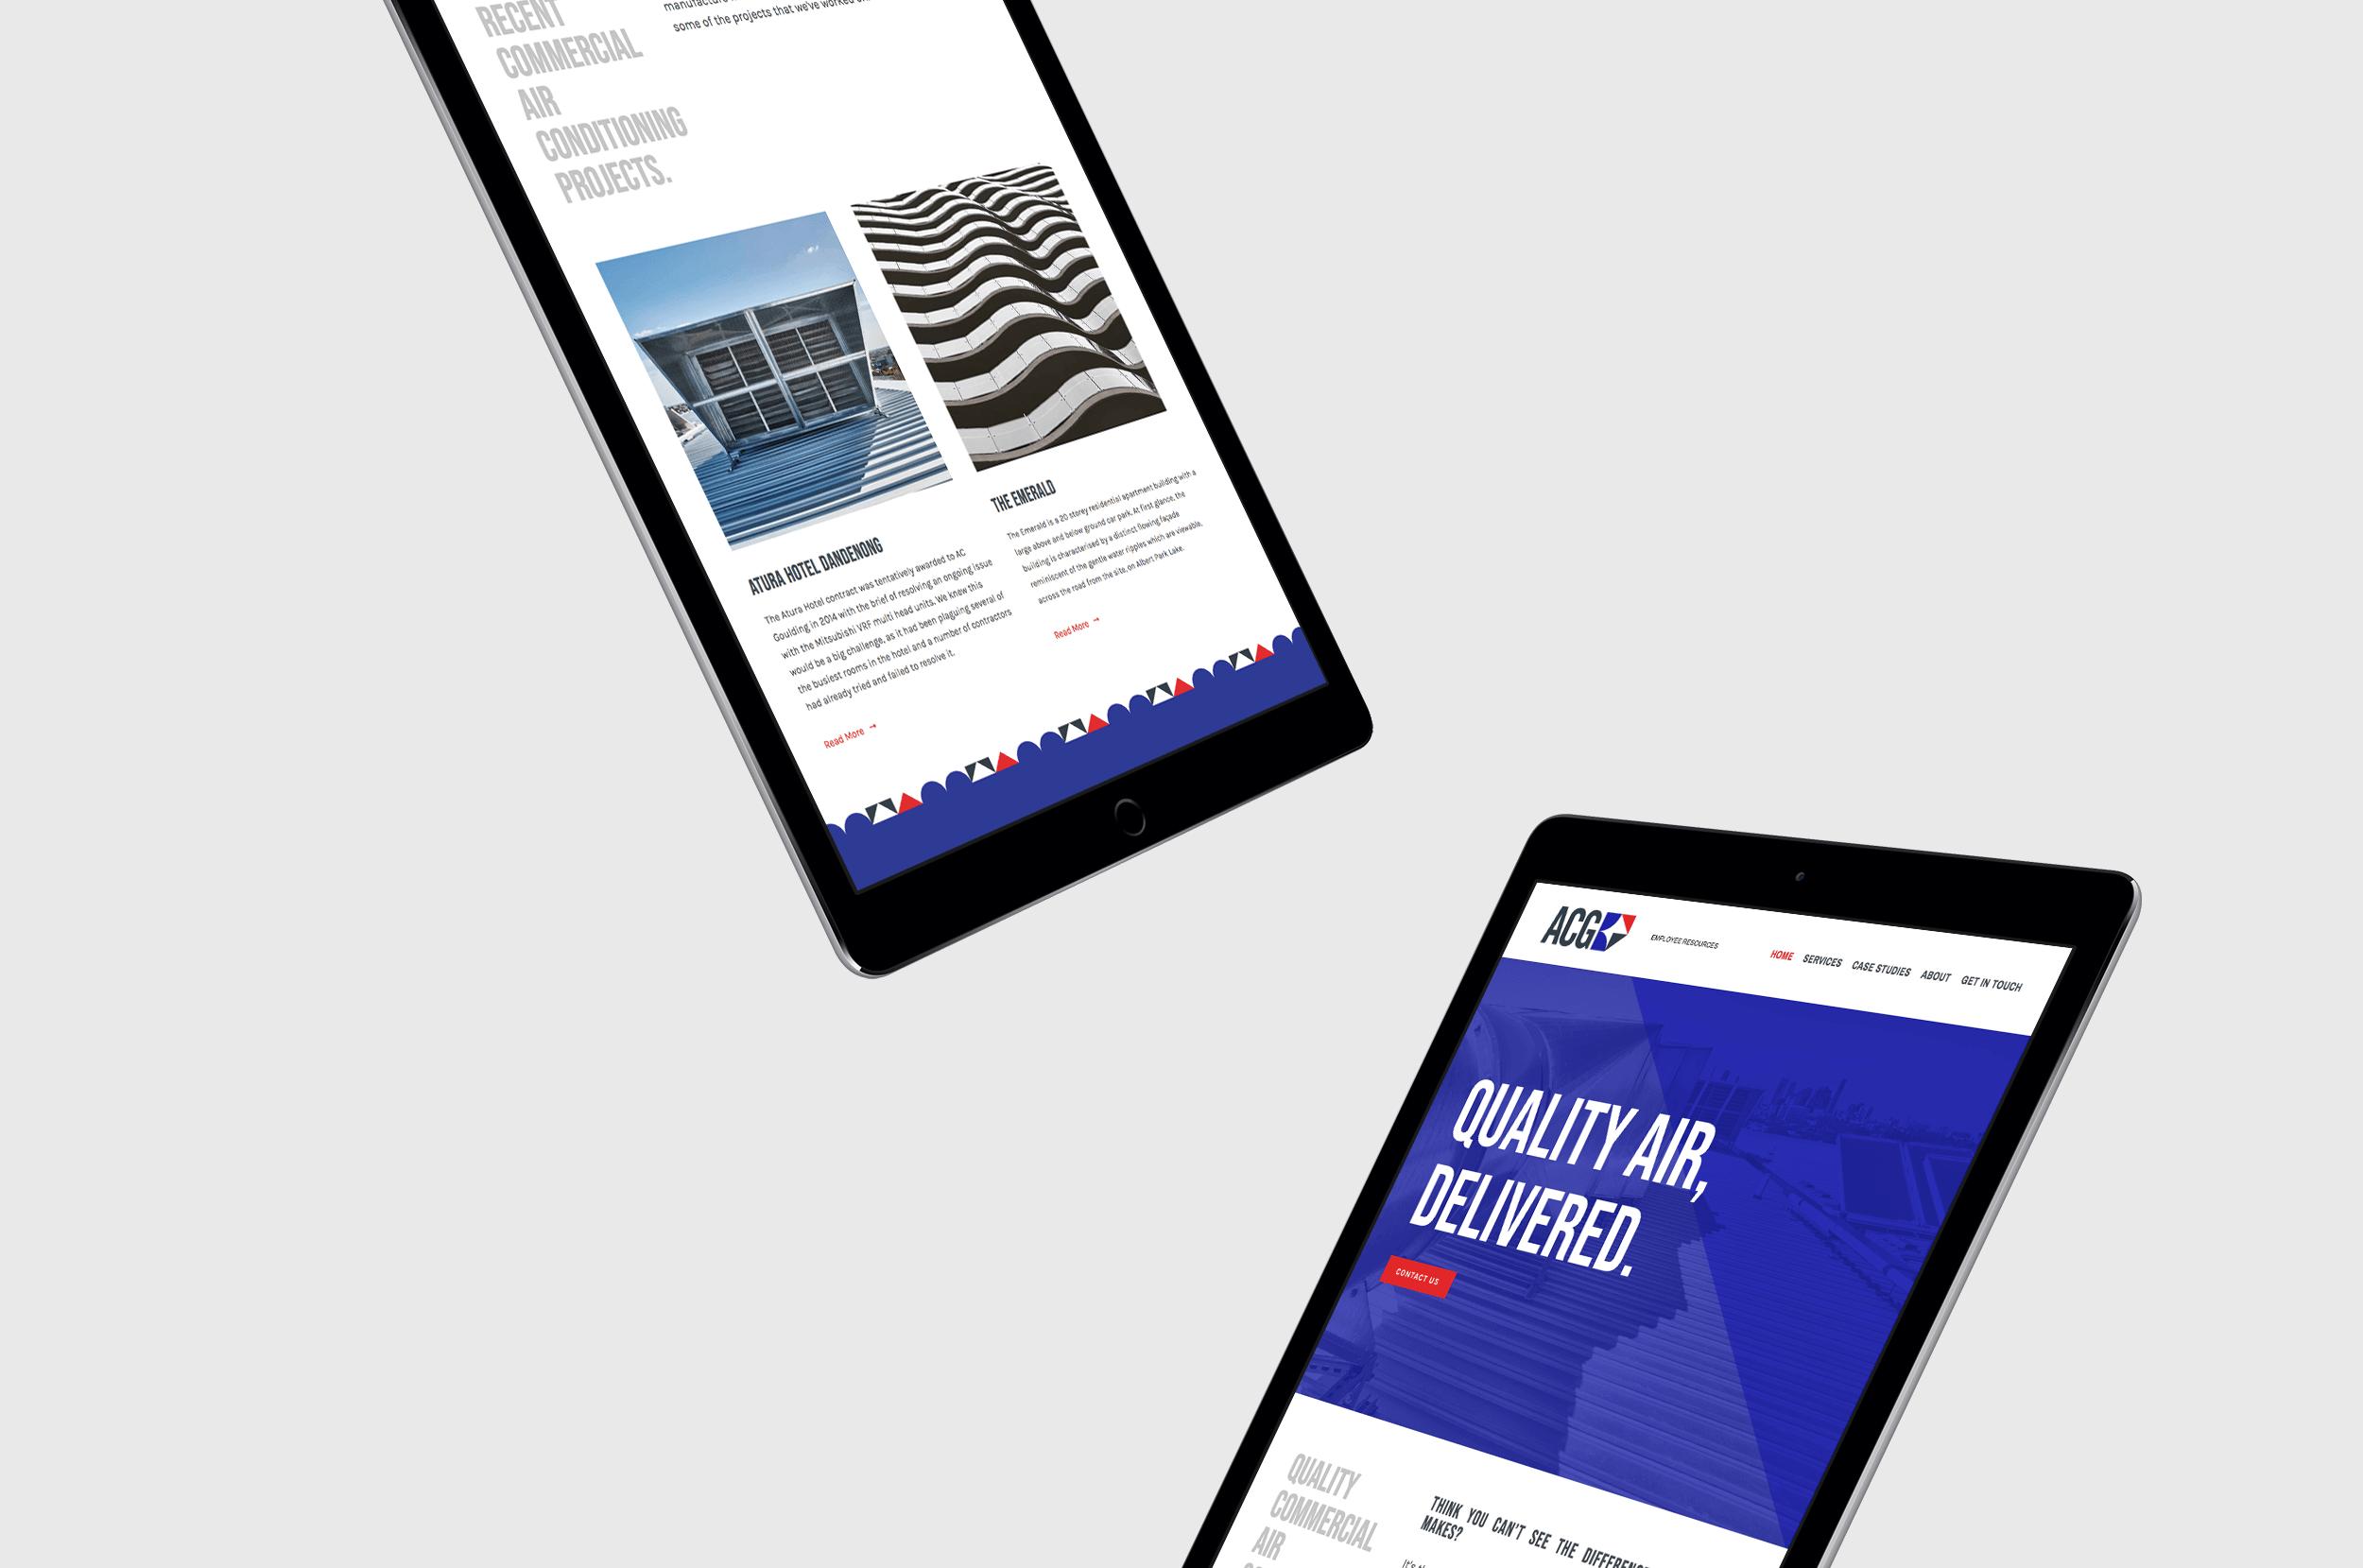 ac-goulding-squarespace-web-design-melbourne.jpg